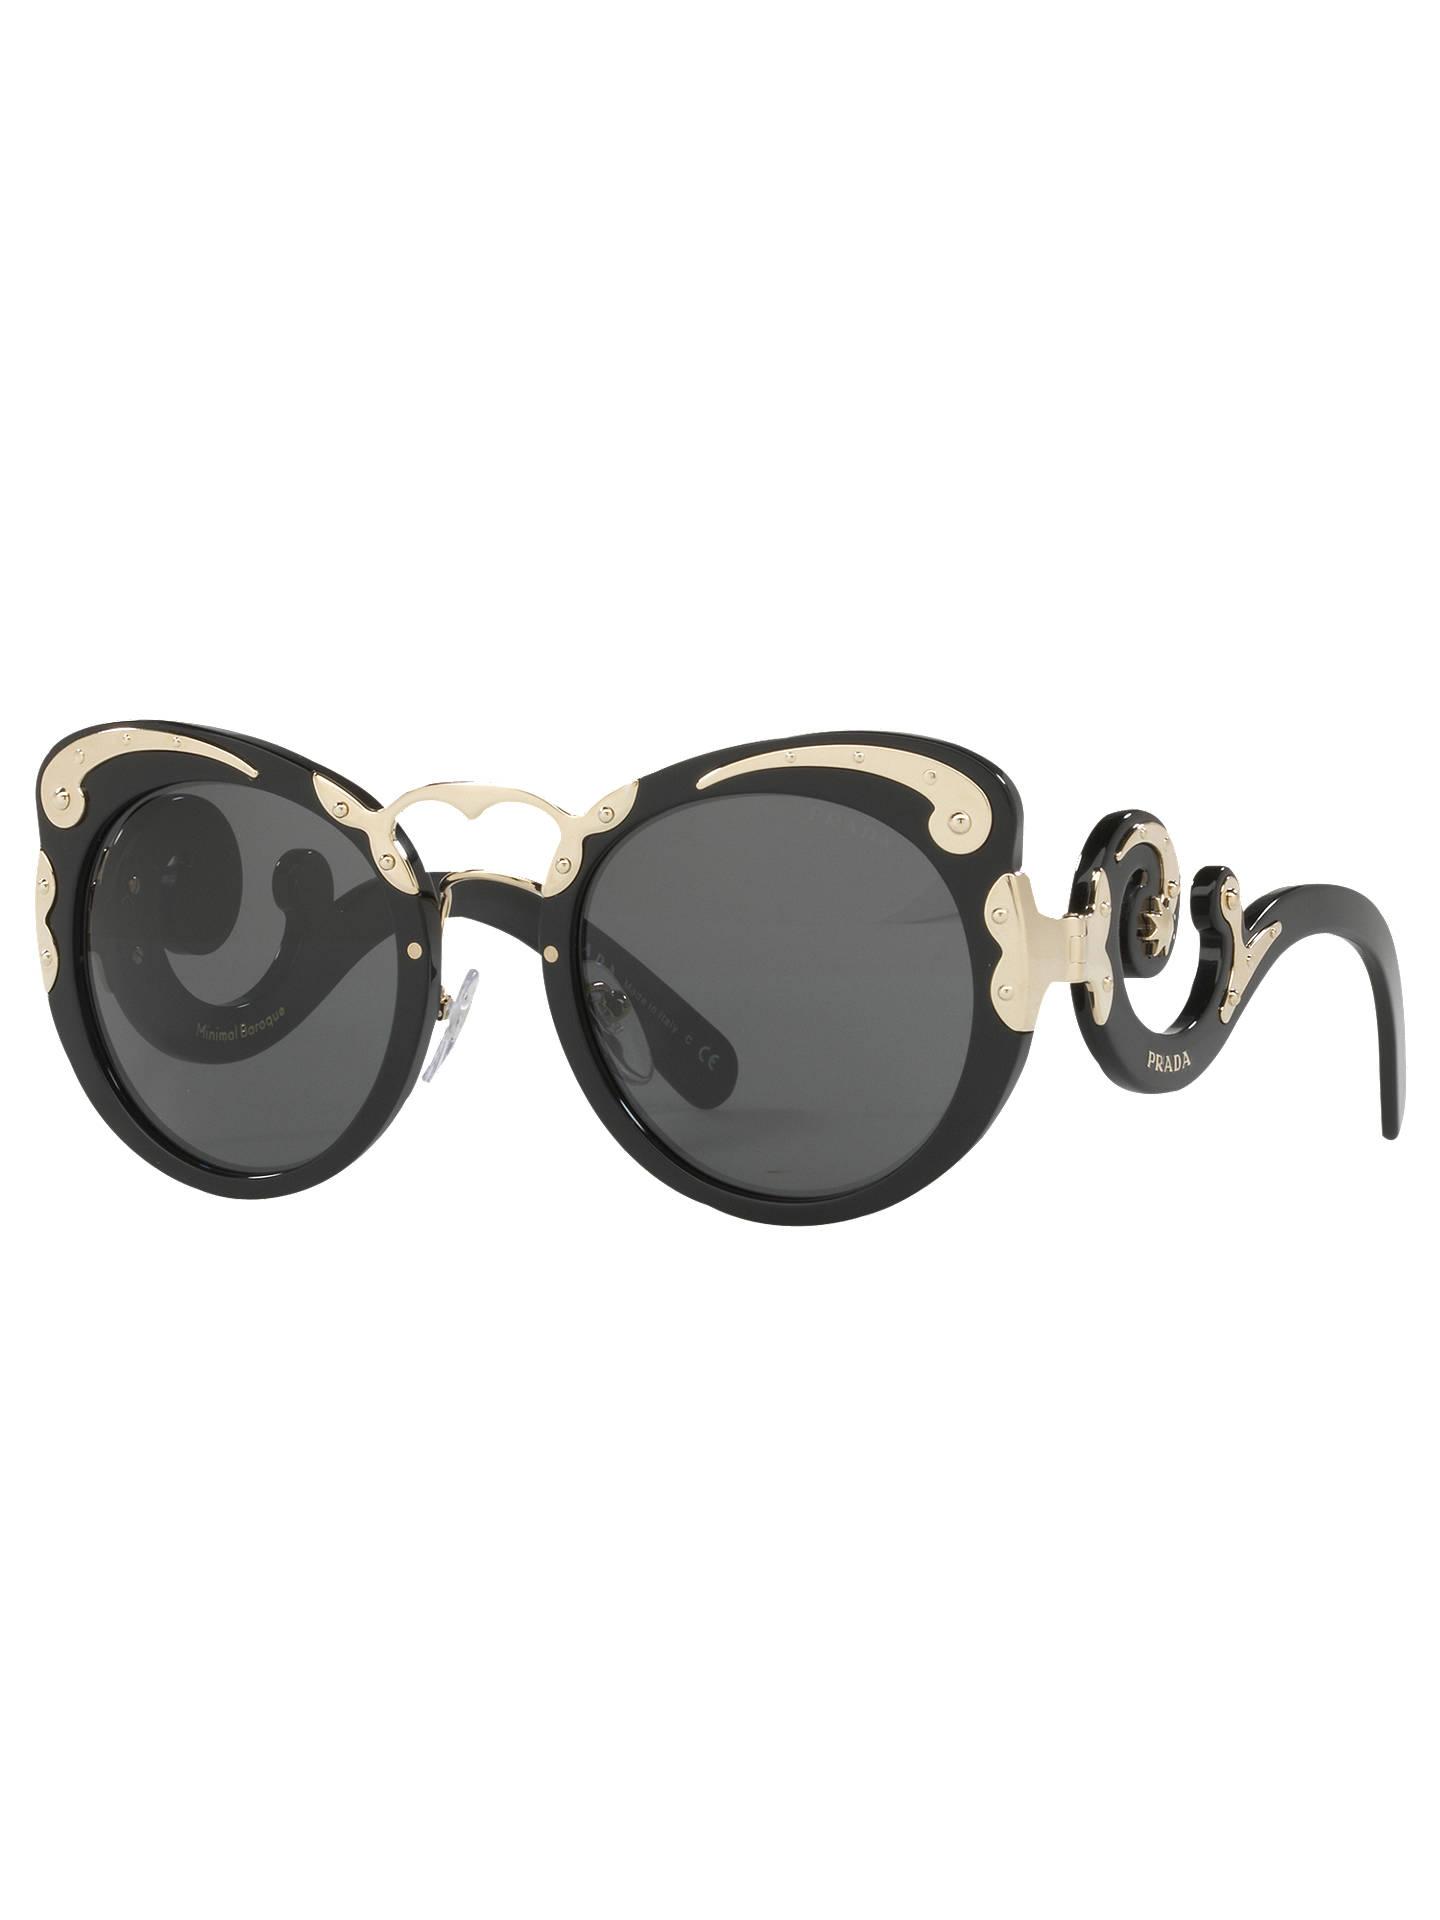 d110911c1c8b8 ... new arrivals buyprada pr 07ts structured round sunglasses black online  at johnlewis c7794 17665 spain prada ...